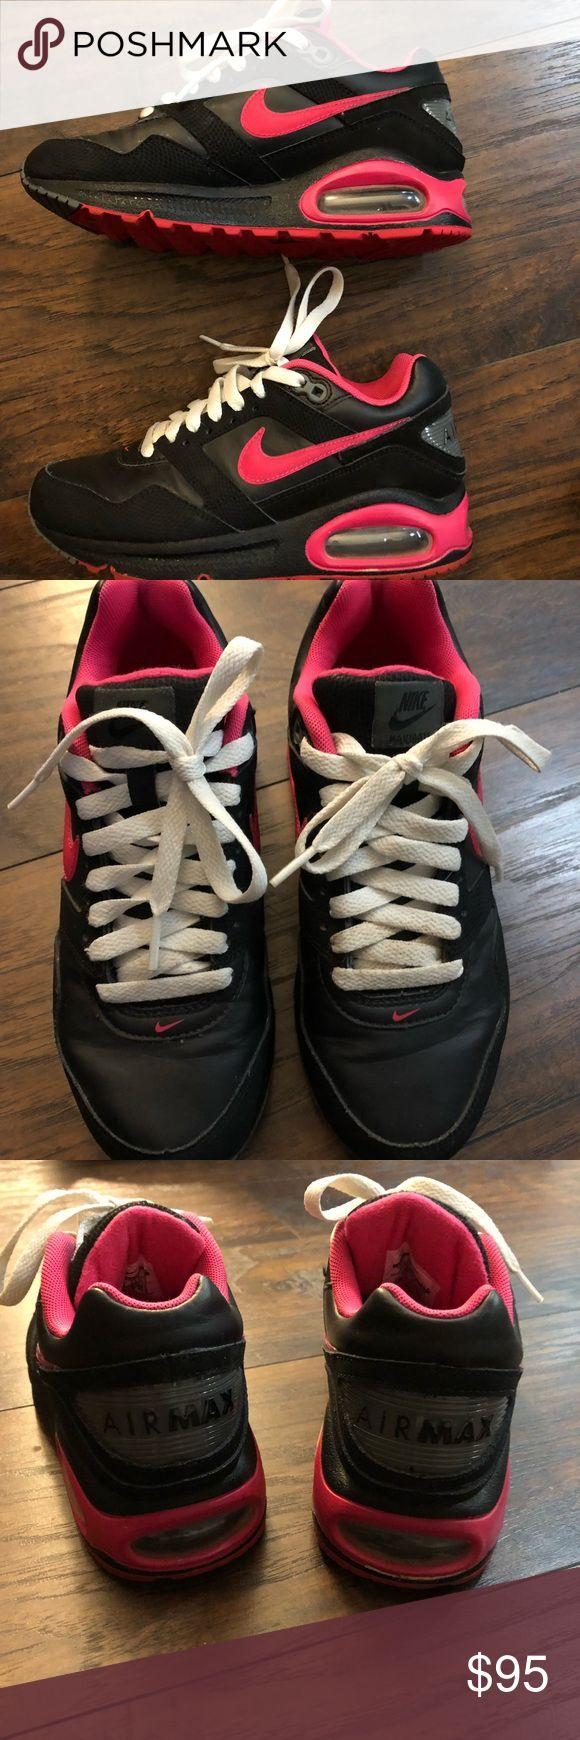 Women's Nike AirMax Worn once. Slight scuff mark on back